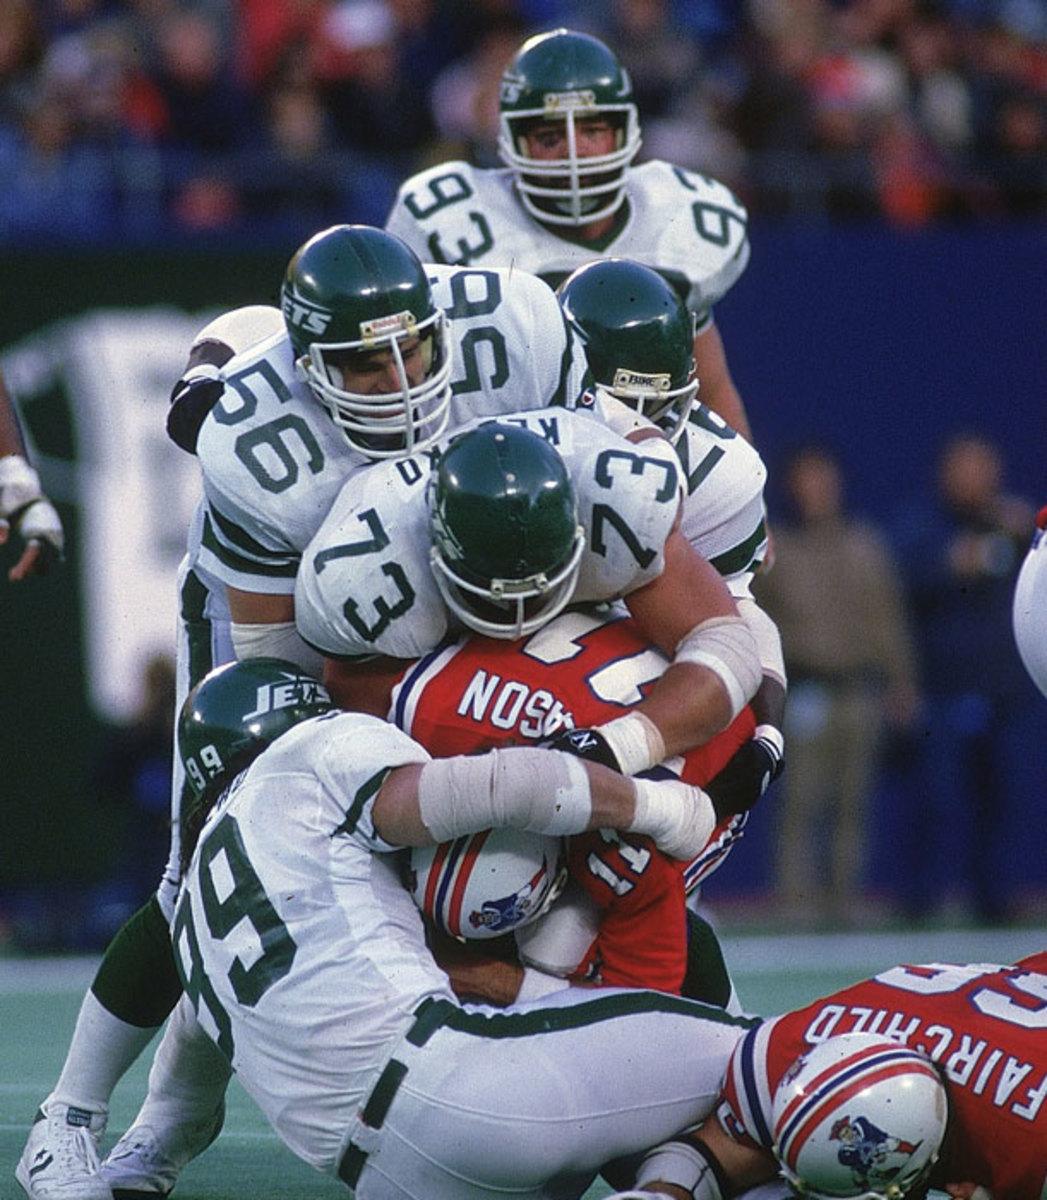 New York Jets defense